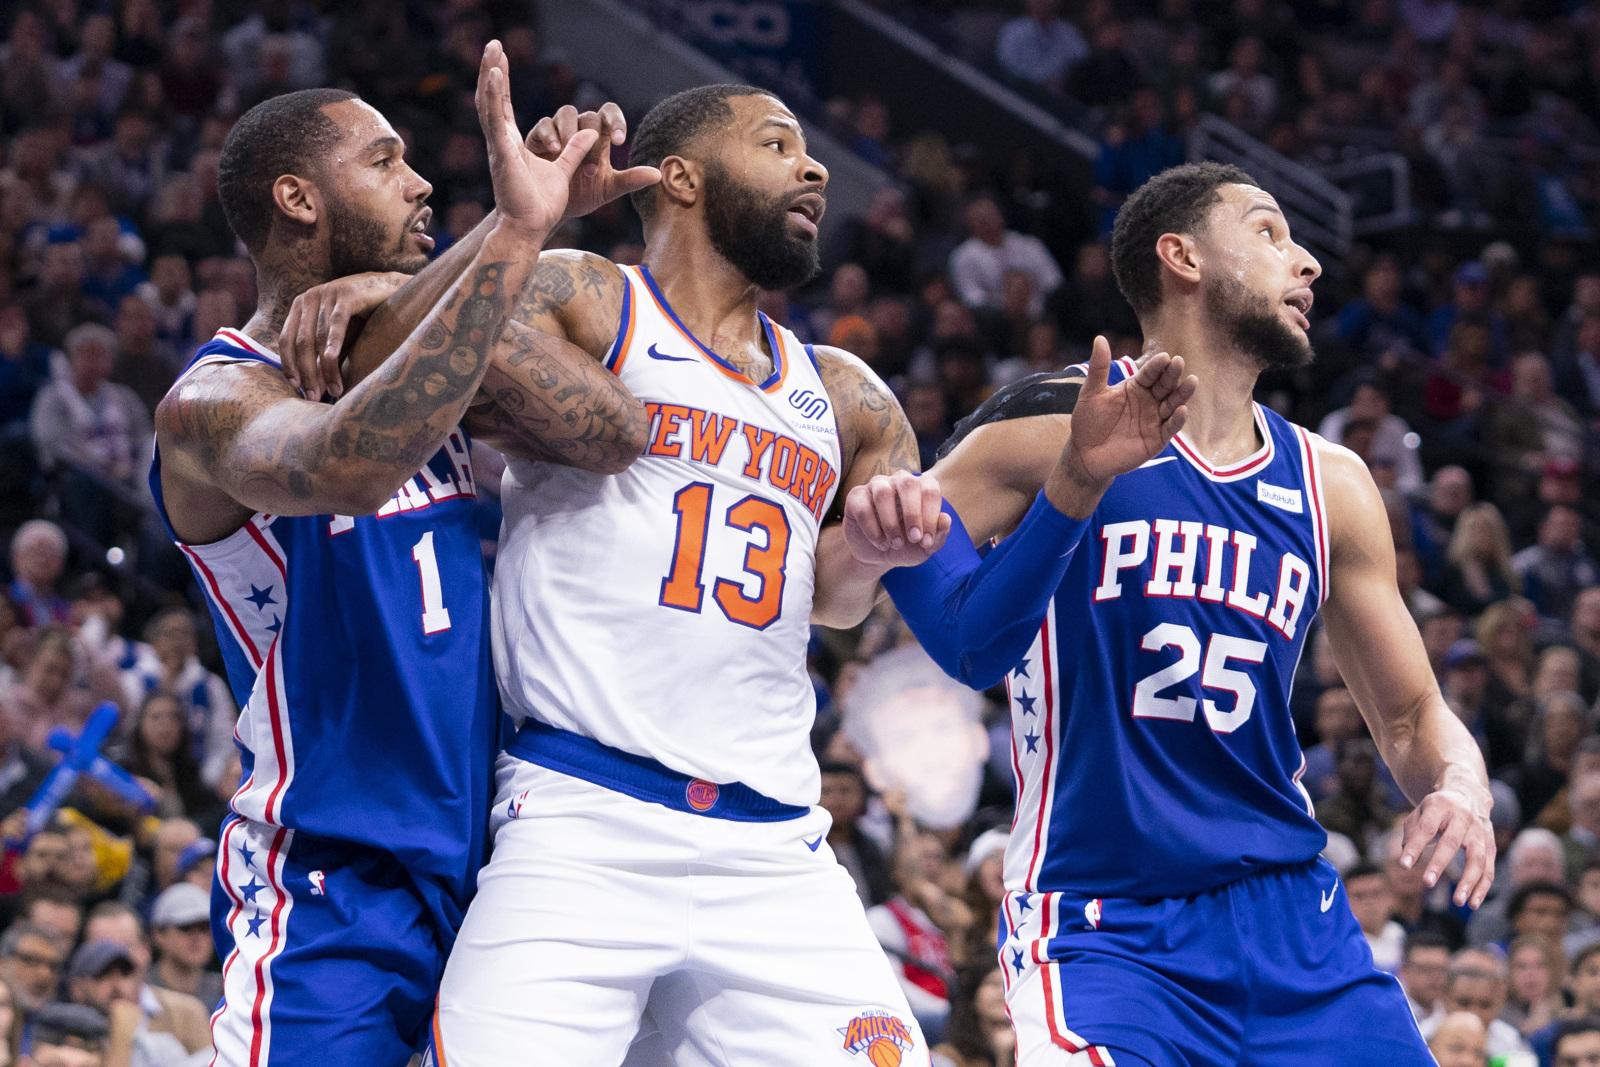 Ben Simmons: The New York Knicks Next Point Guard?